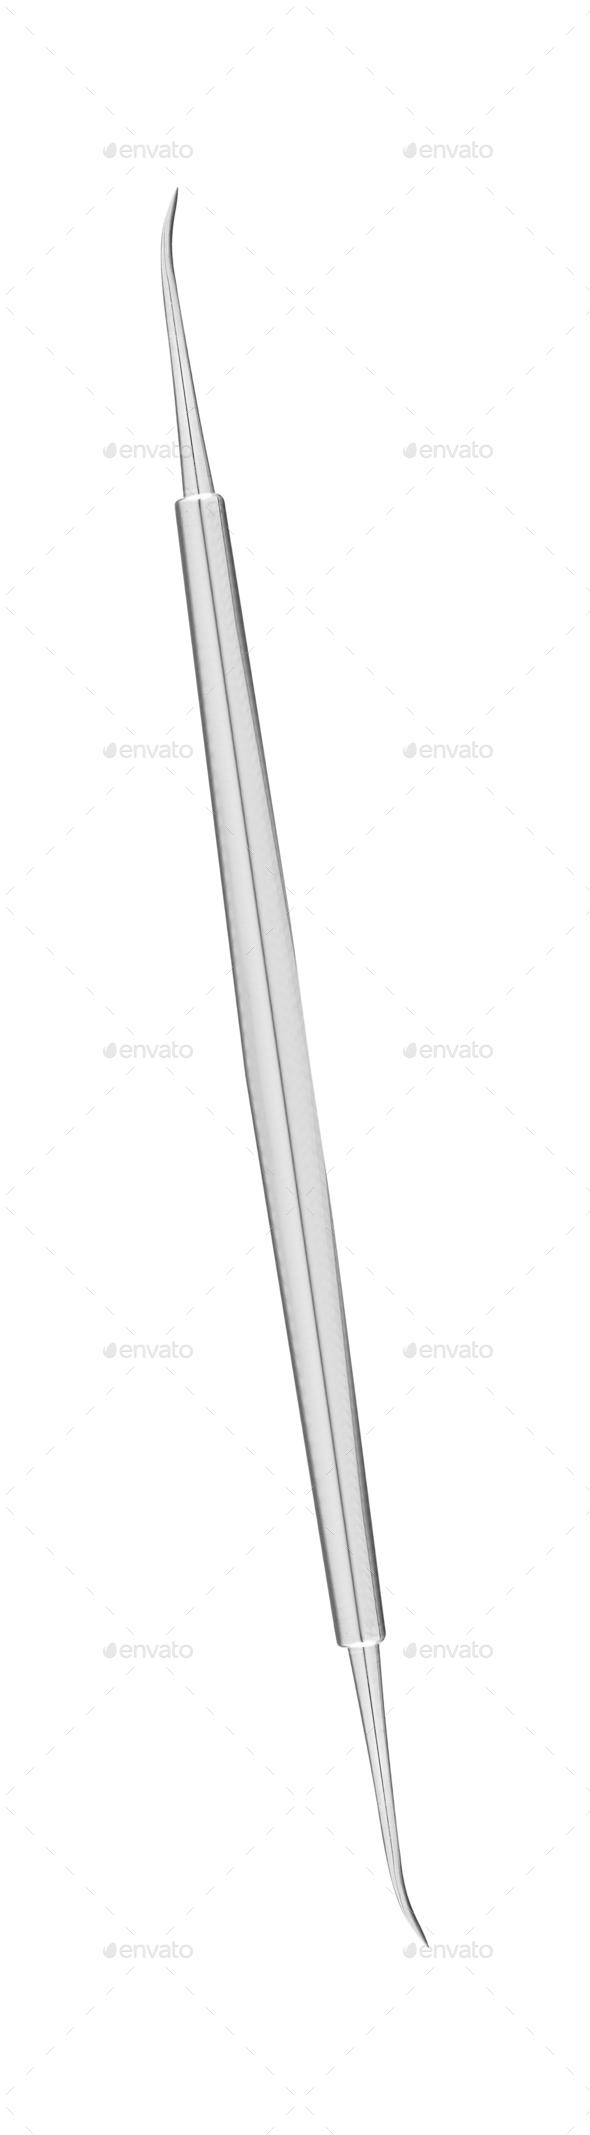 Dental probe - Stock Photo - Images